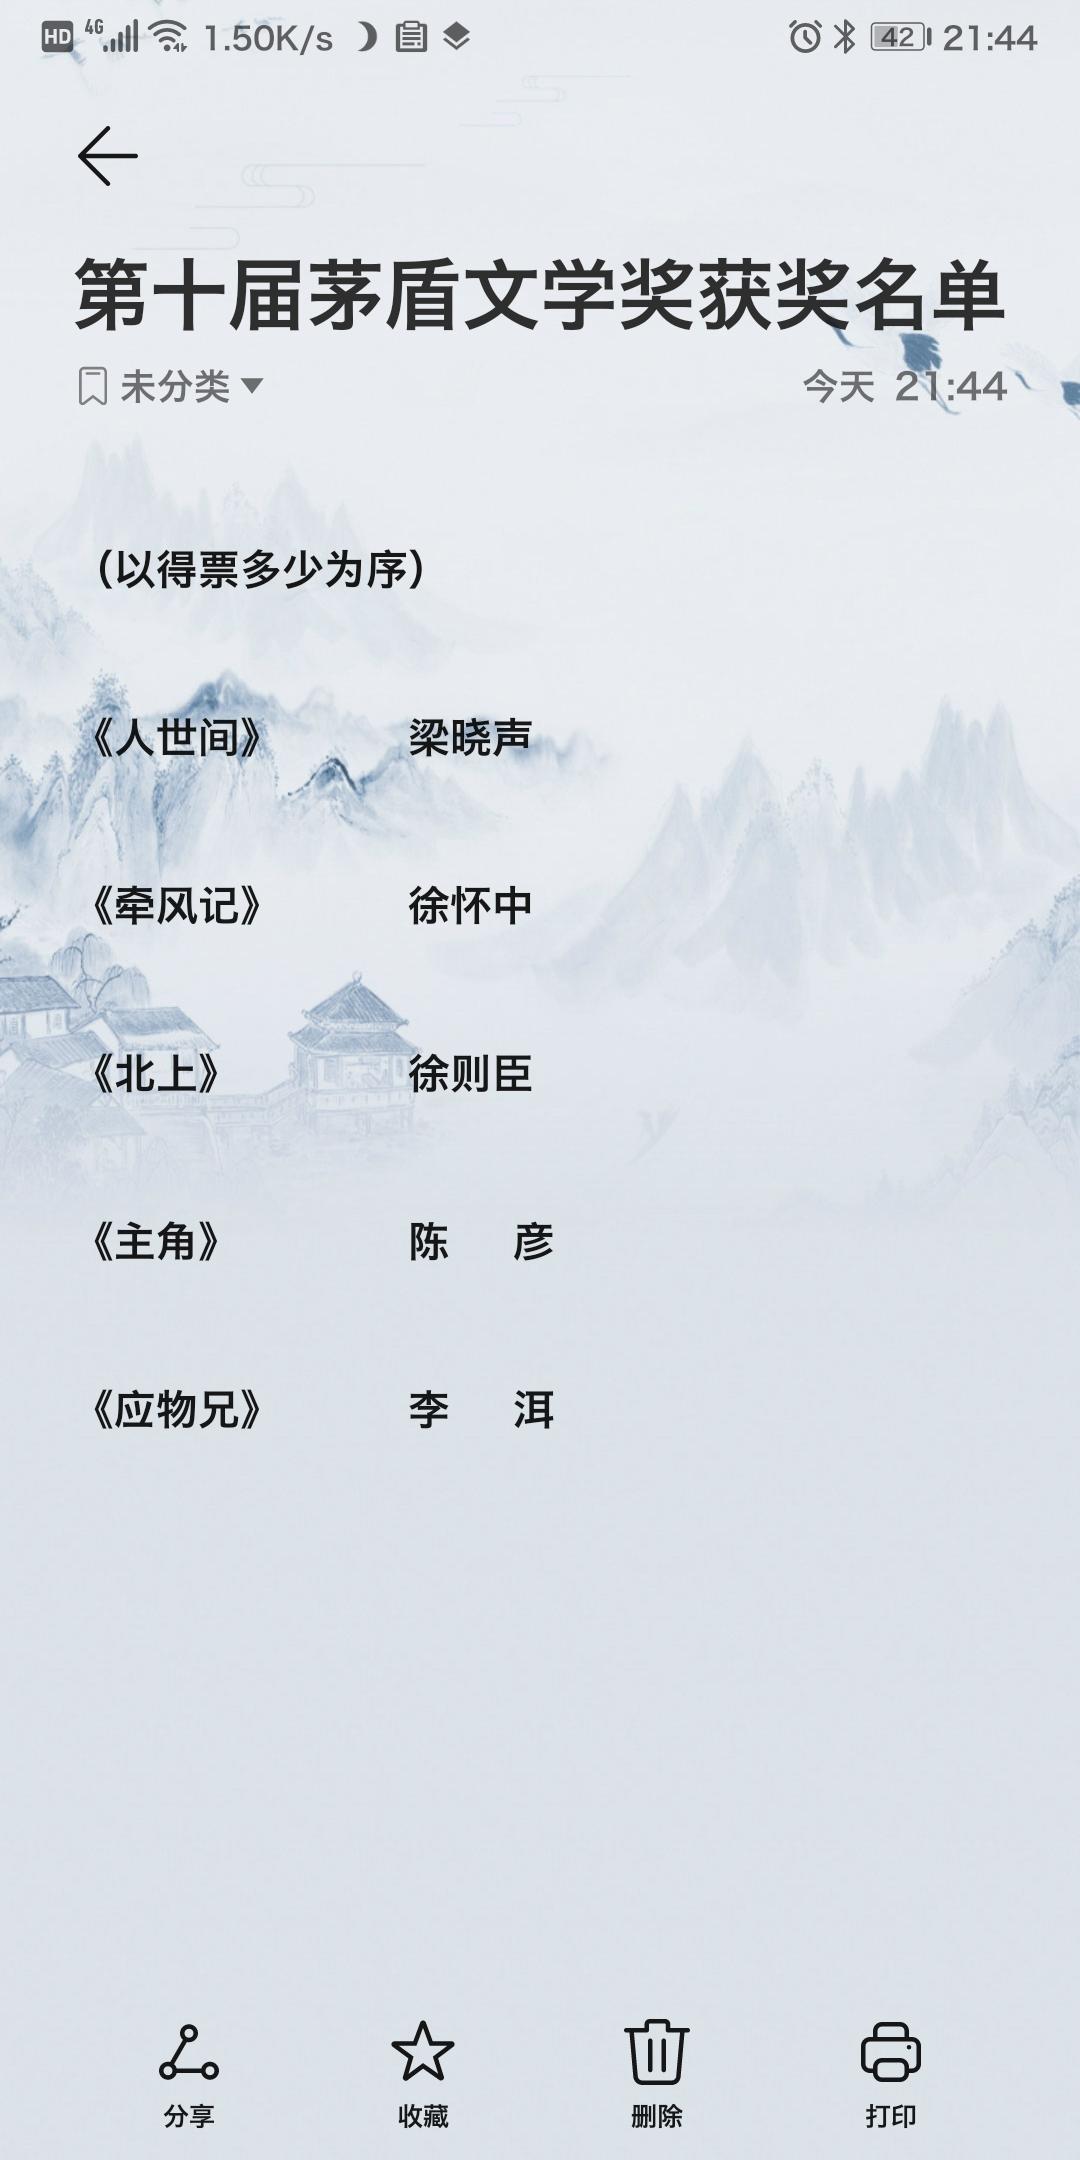 Screenshot_20200107_214415_com.example.android.notepad.jpg